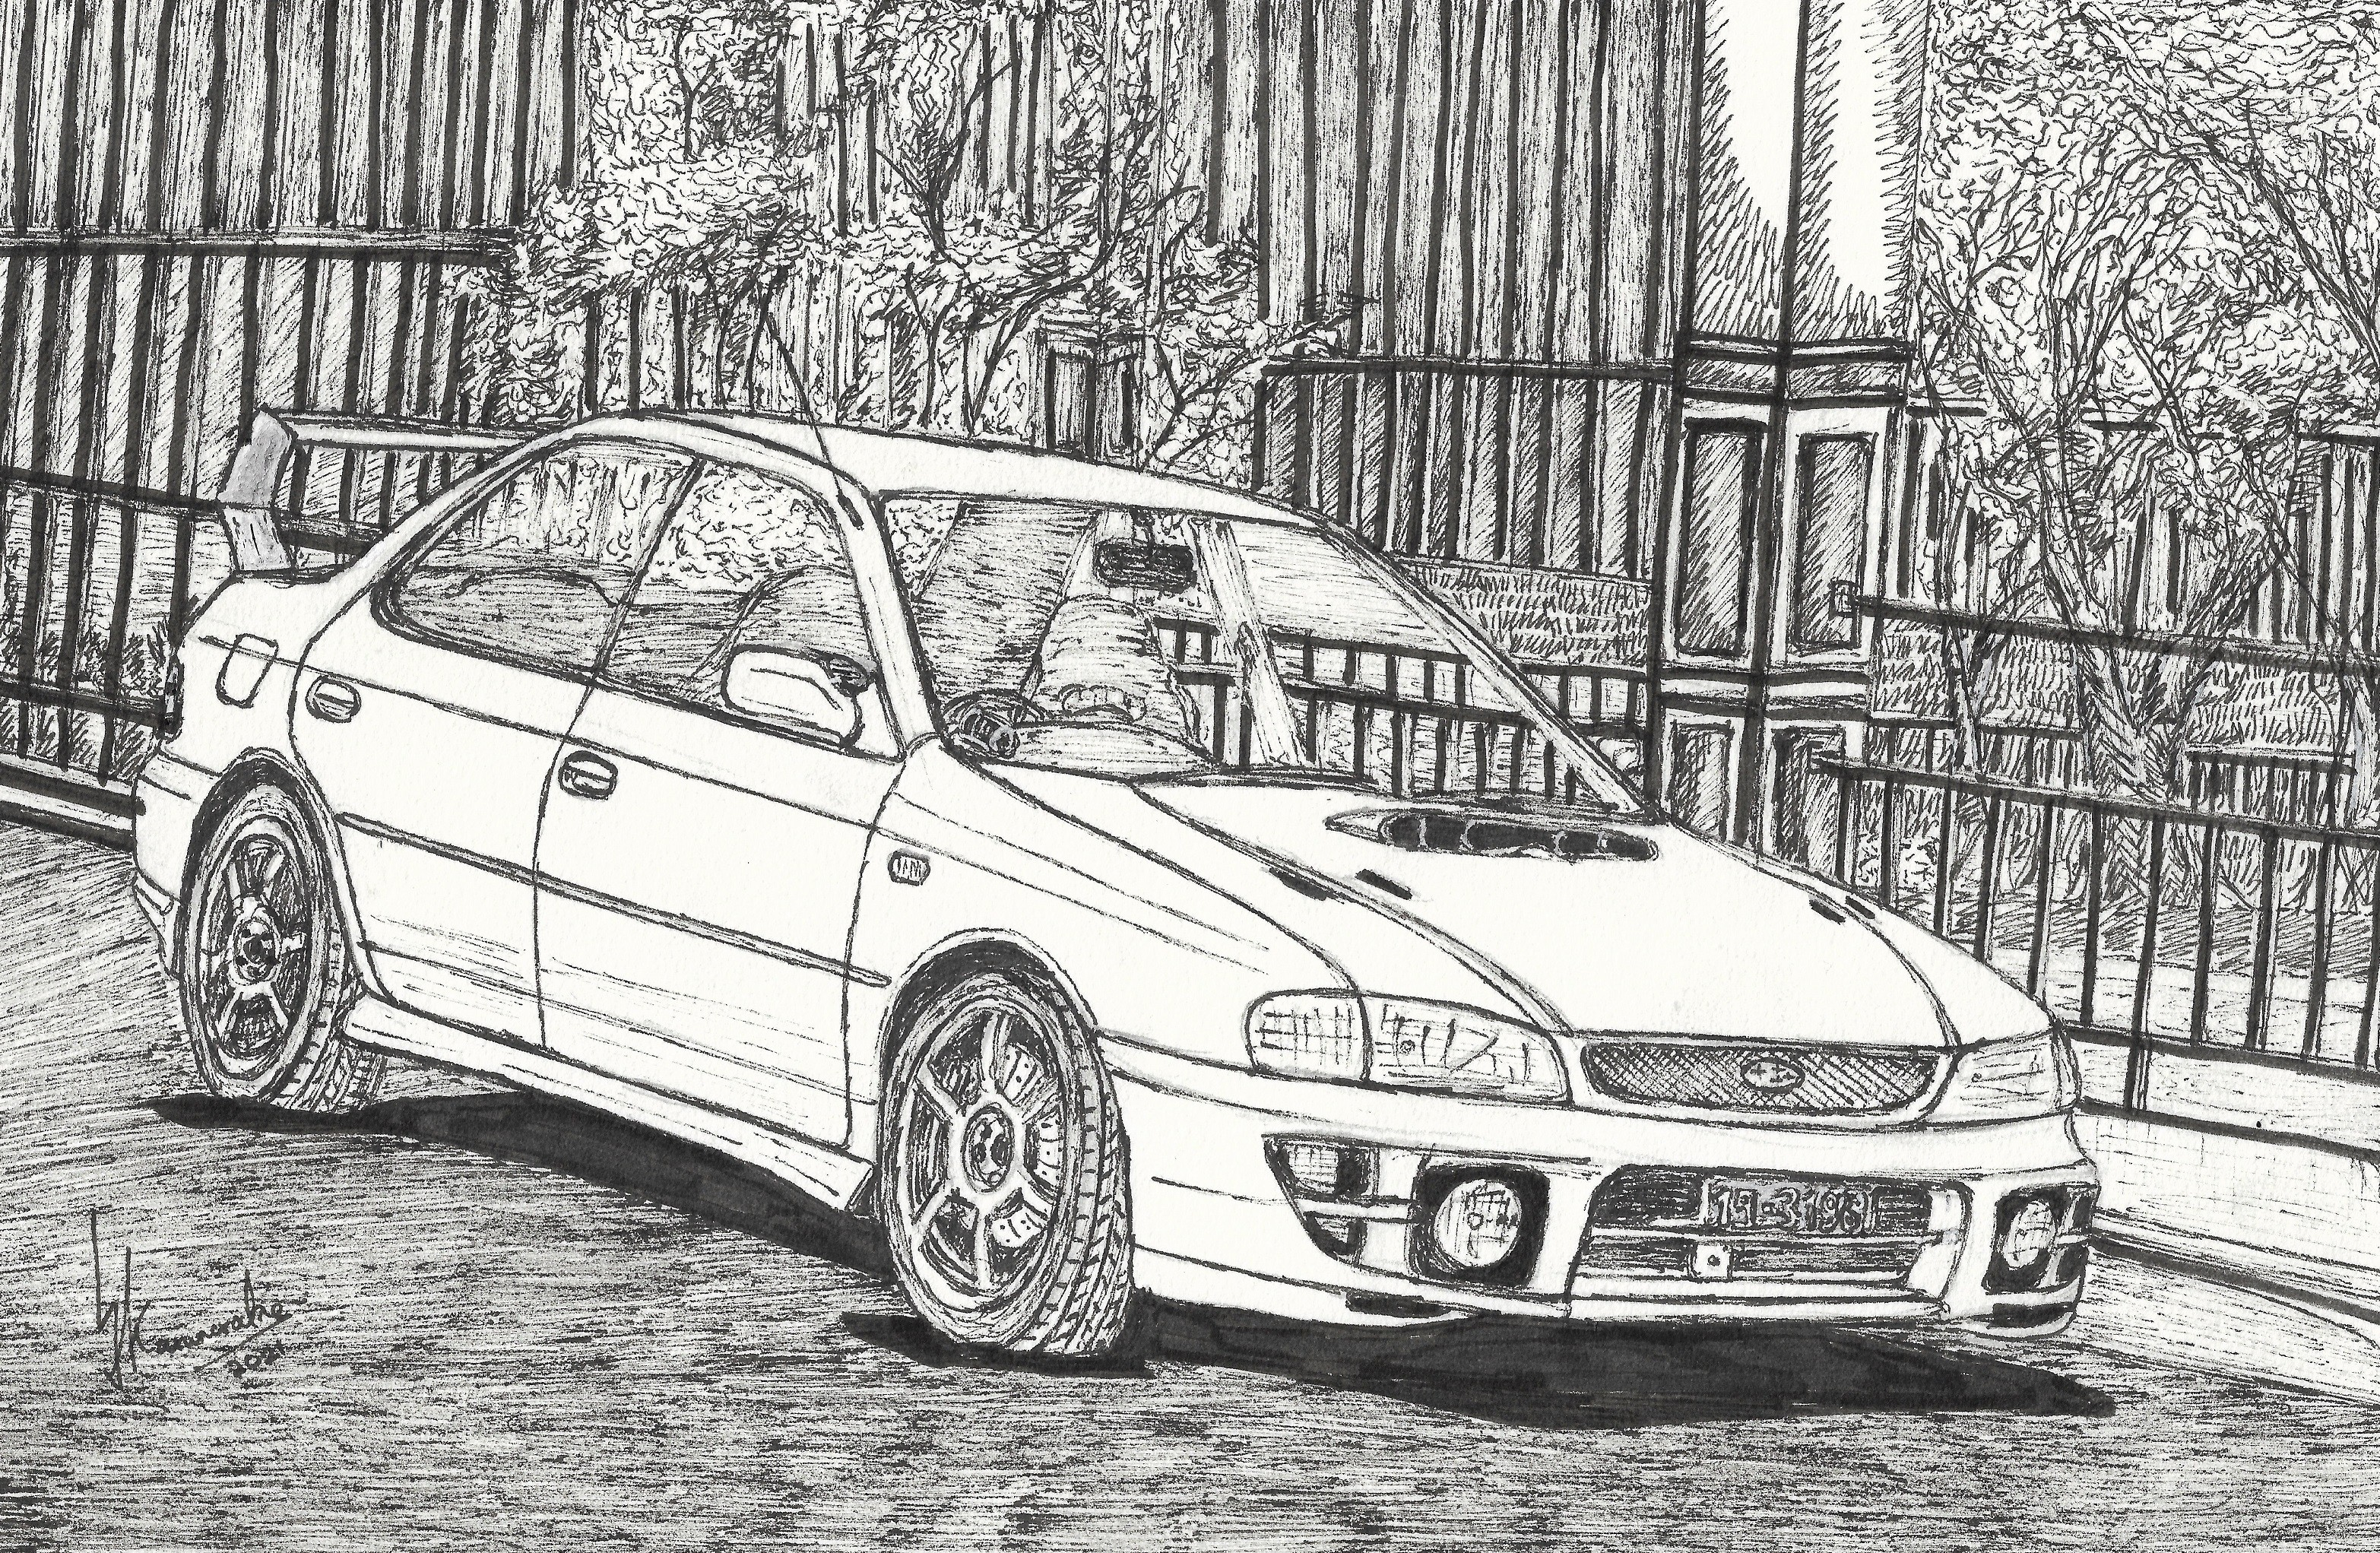 Subaru Impreza Park Days by Car Artist Lahiru